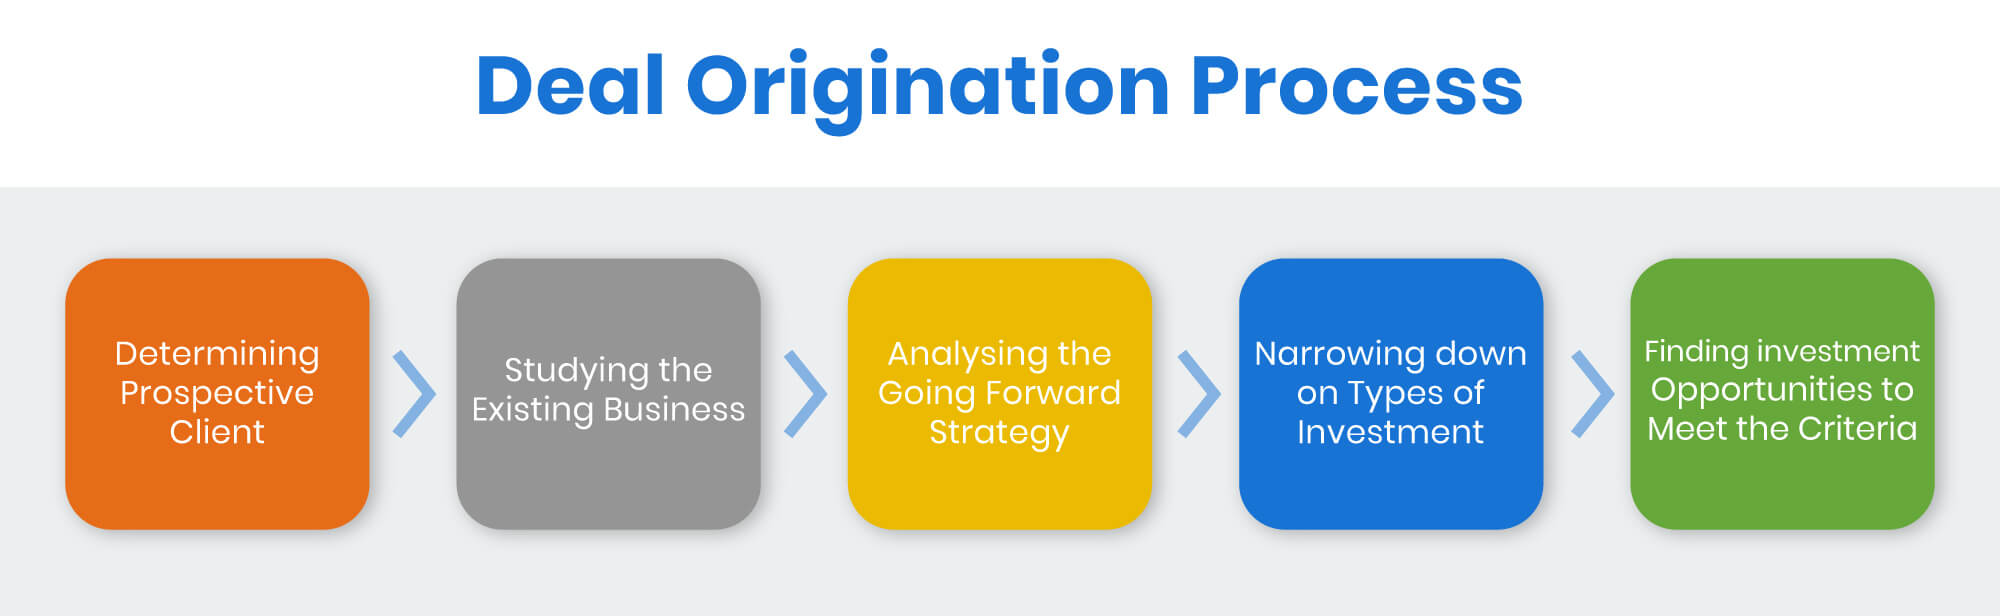 deal origination process